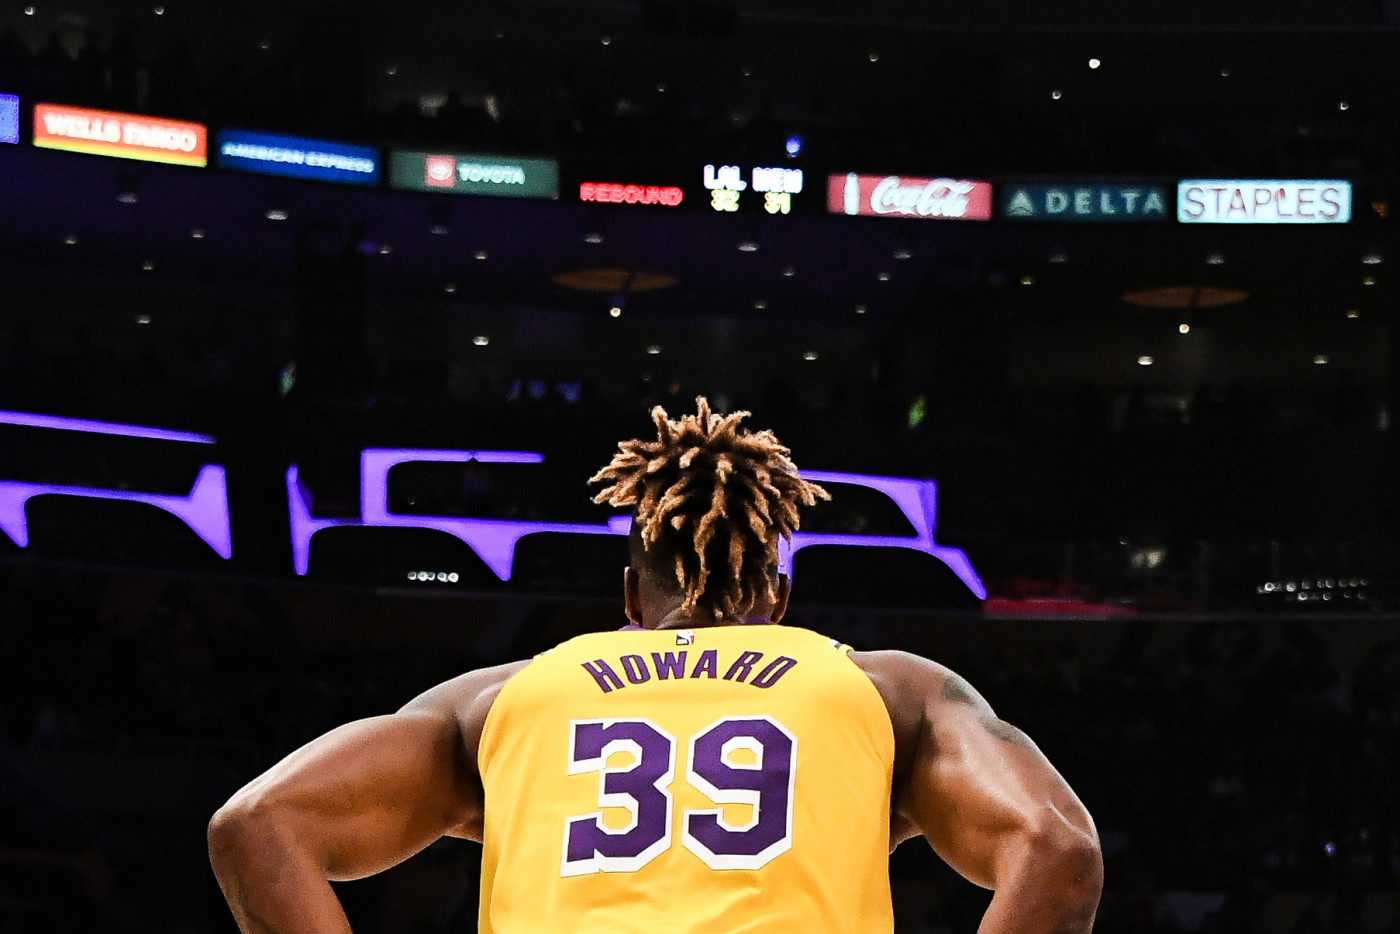 Dwight Howard Lakers Staples Center 2019